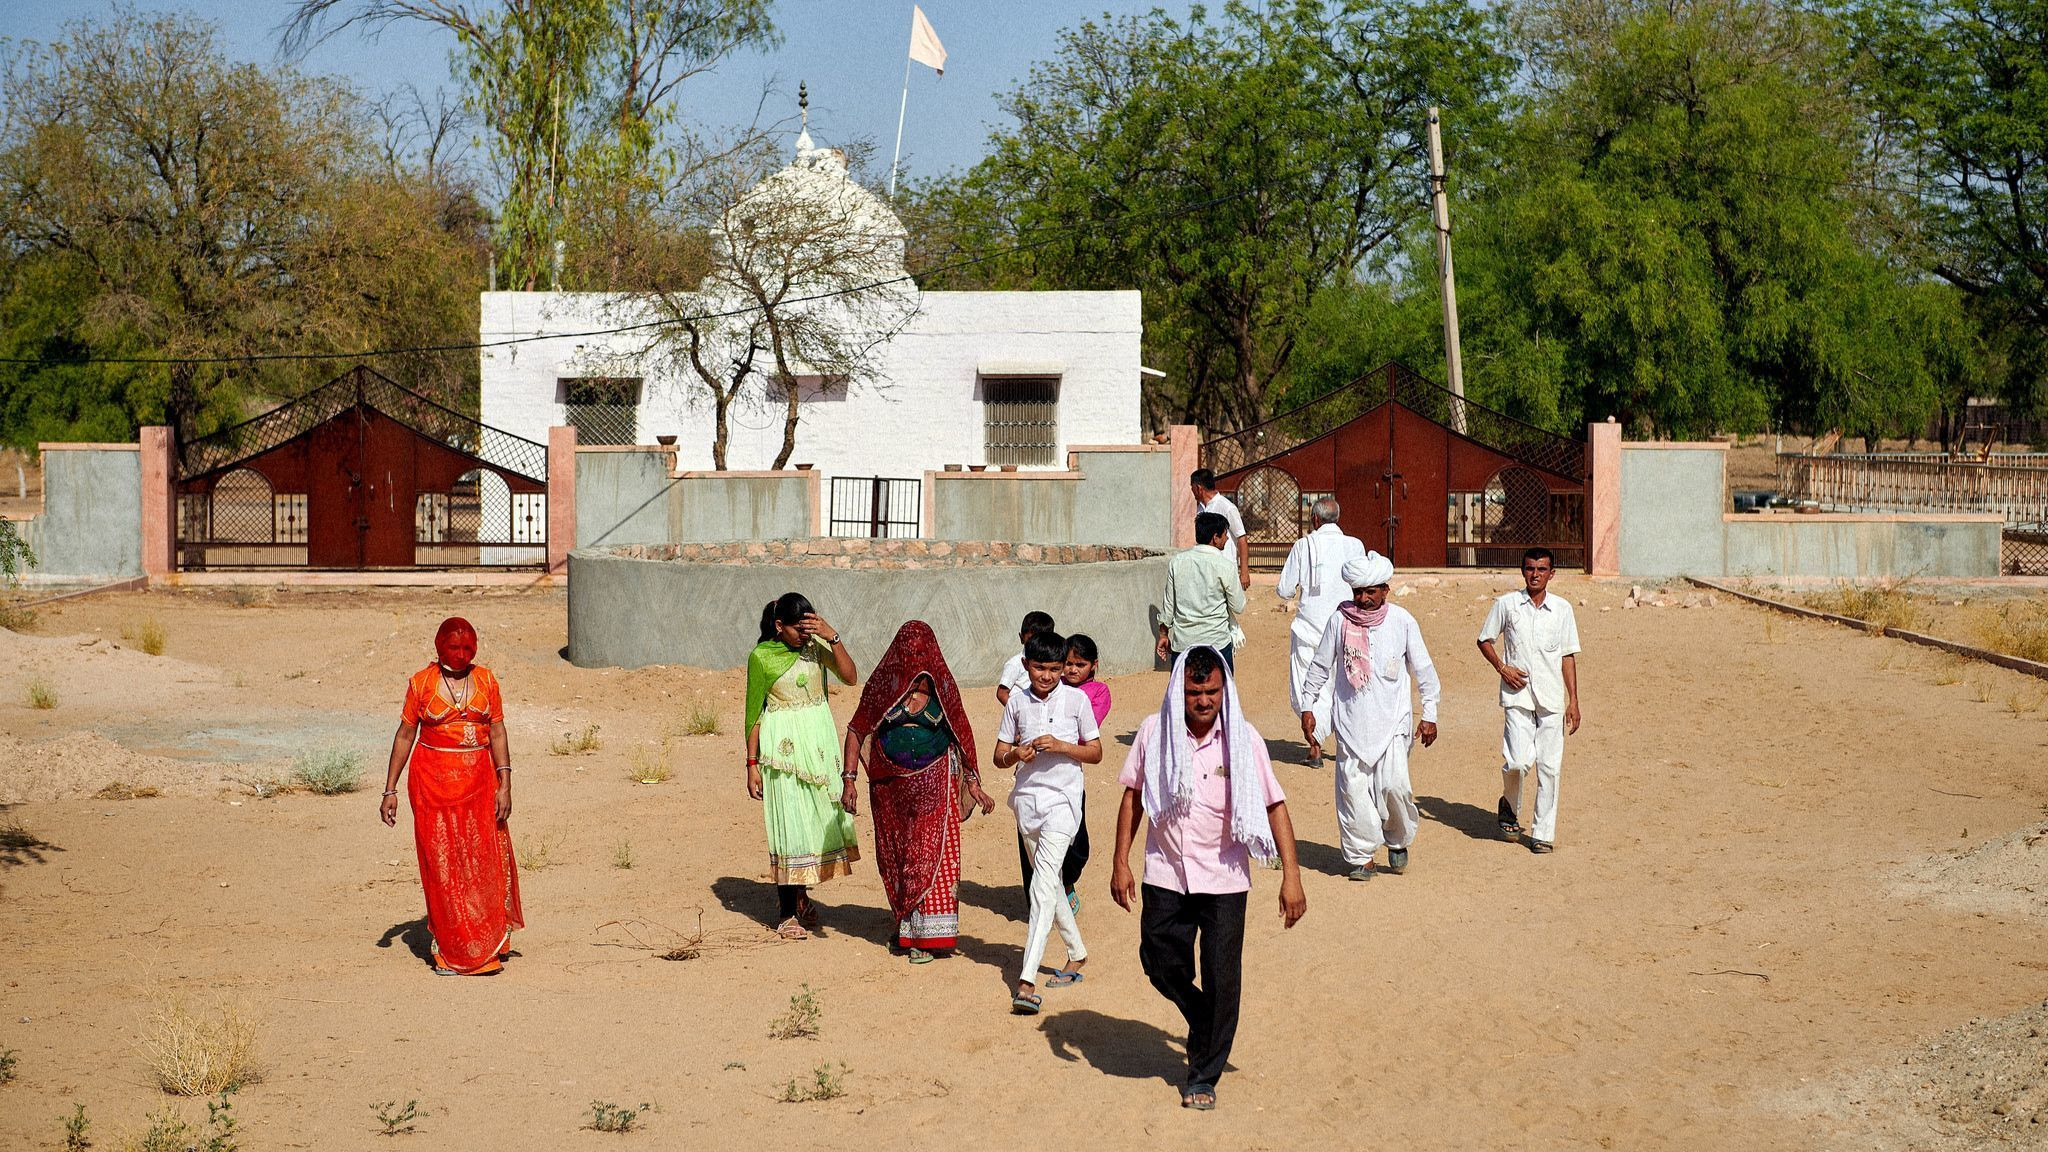 People of Bishnoi community visiting the Bishnoi temple commemorating the Khejarli Massacre.